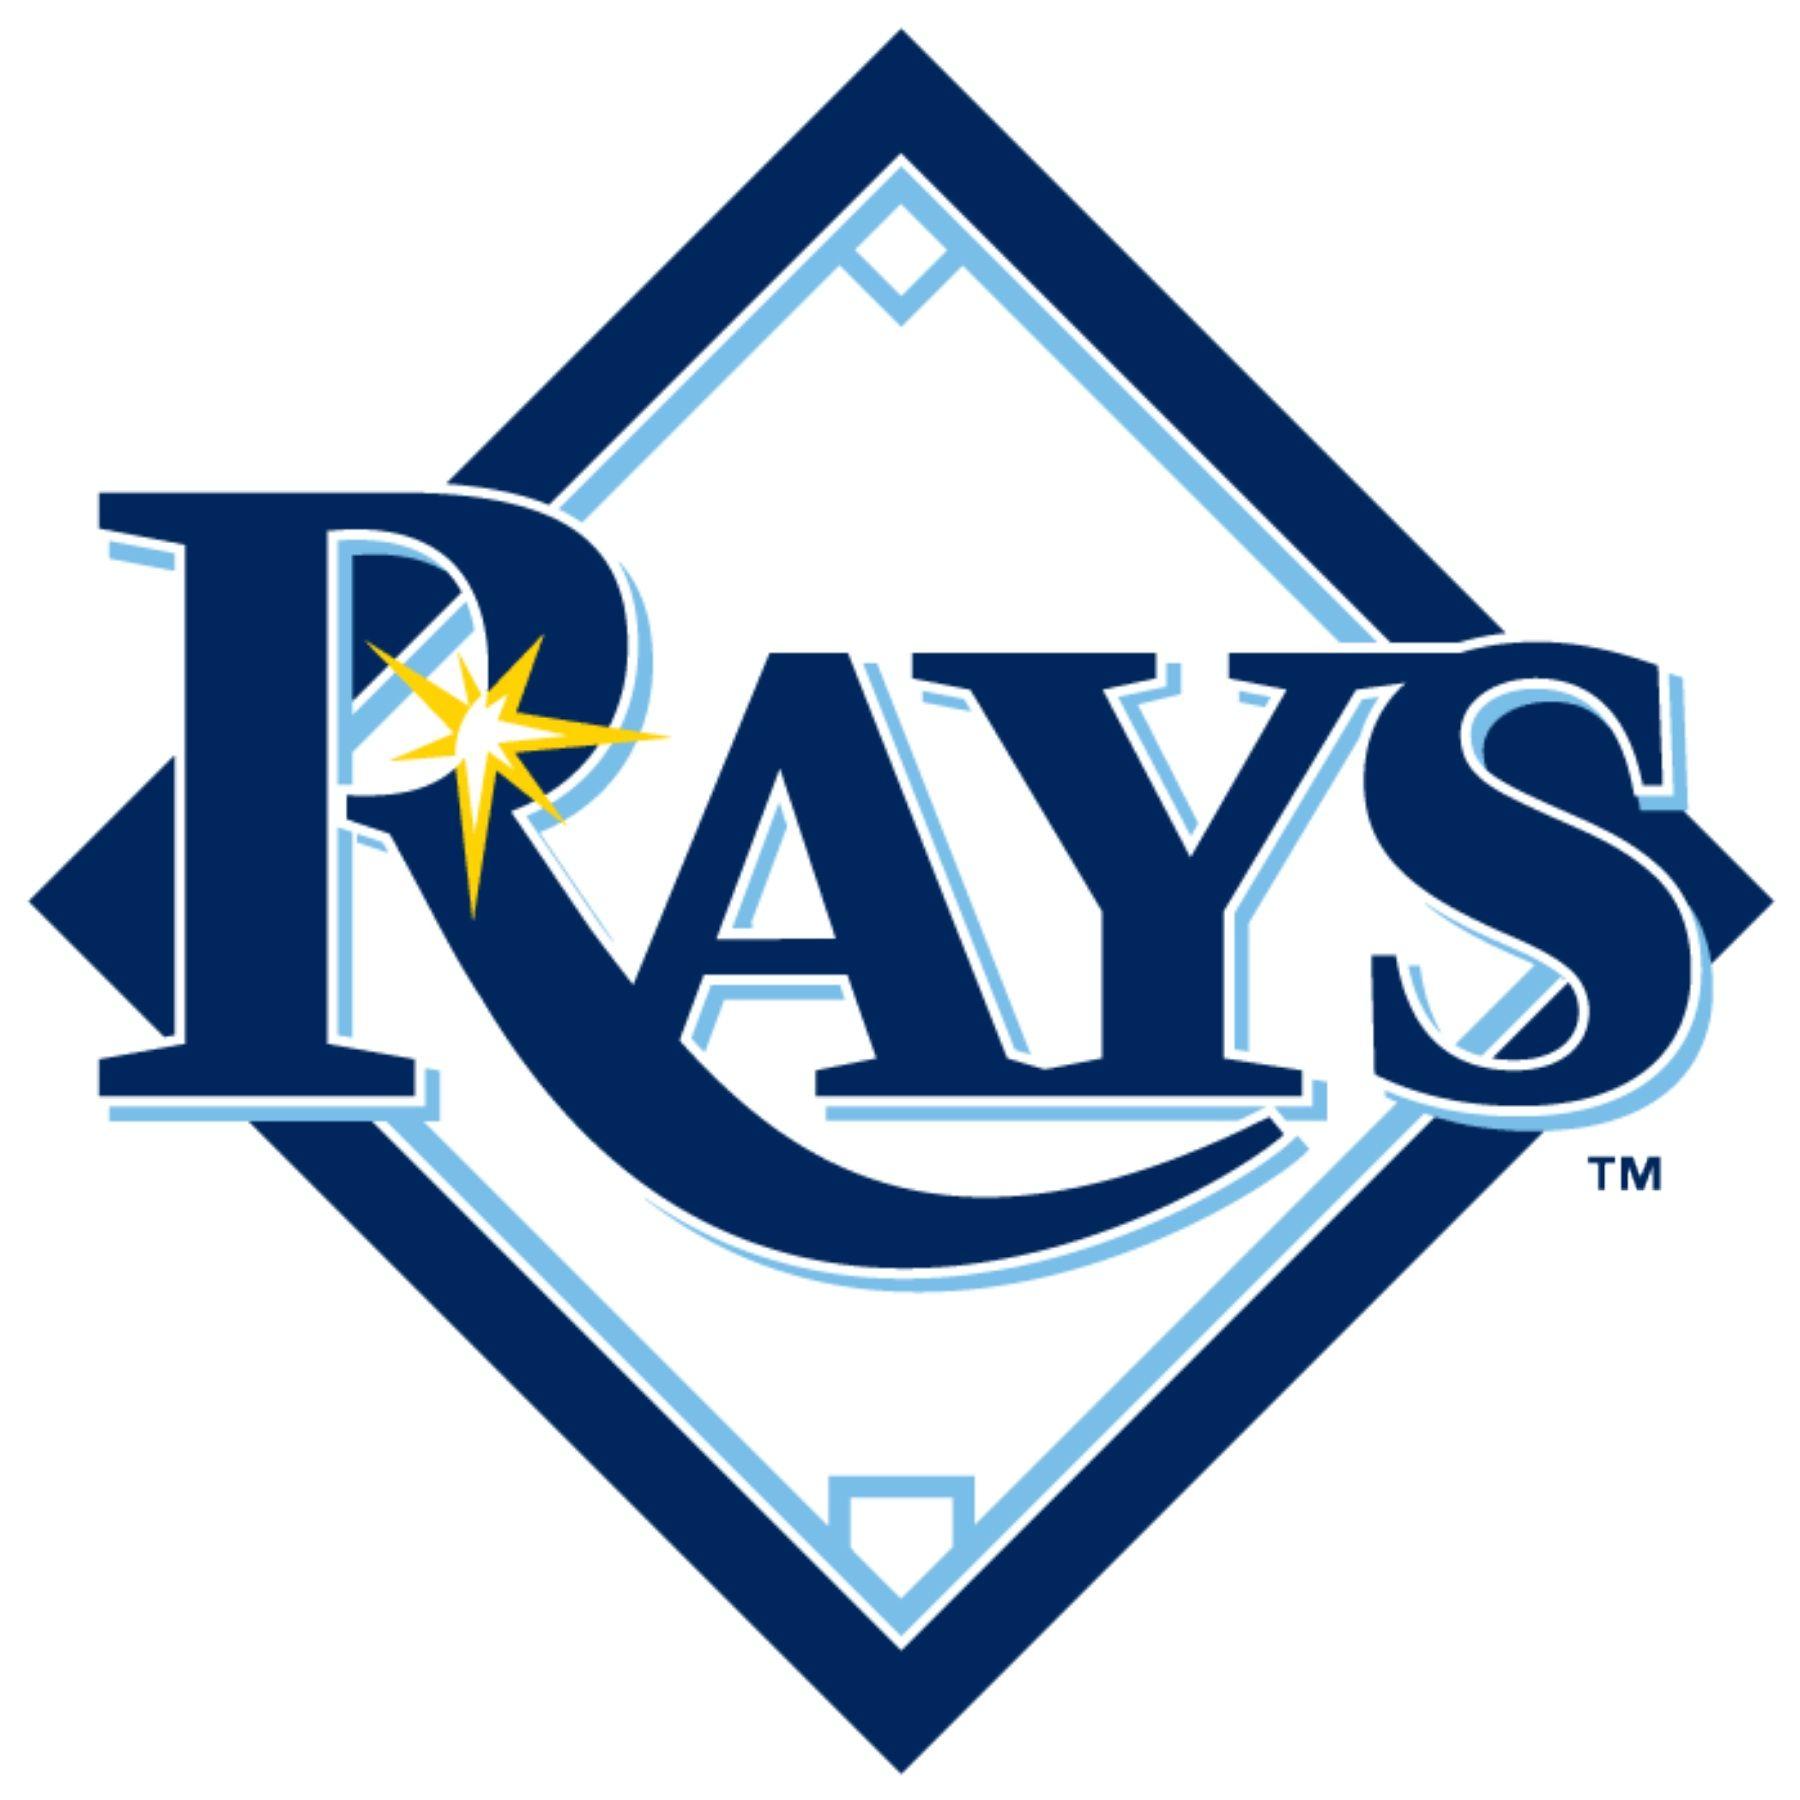 Tampa Bay Rays Logo Rays Logo Tampa Bay Rays Rays Baseball